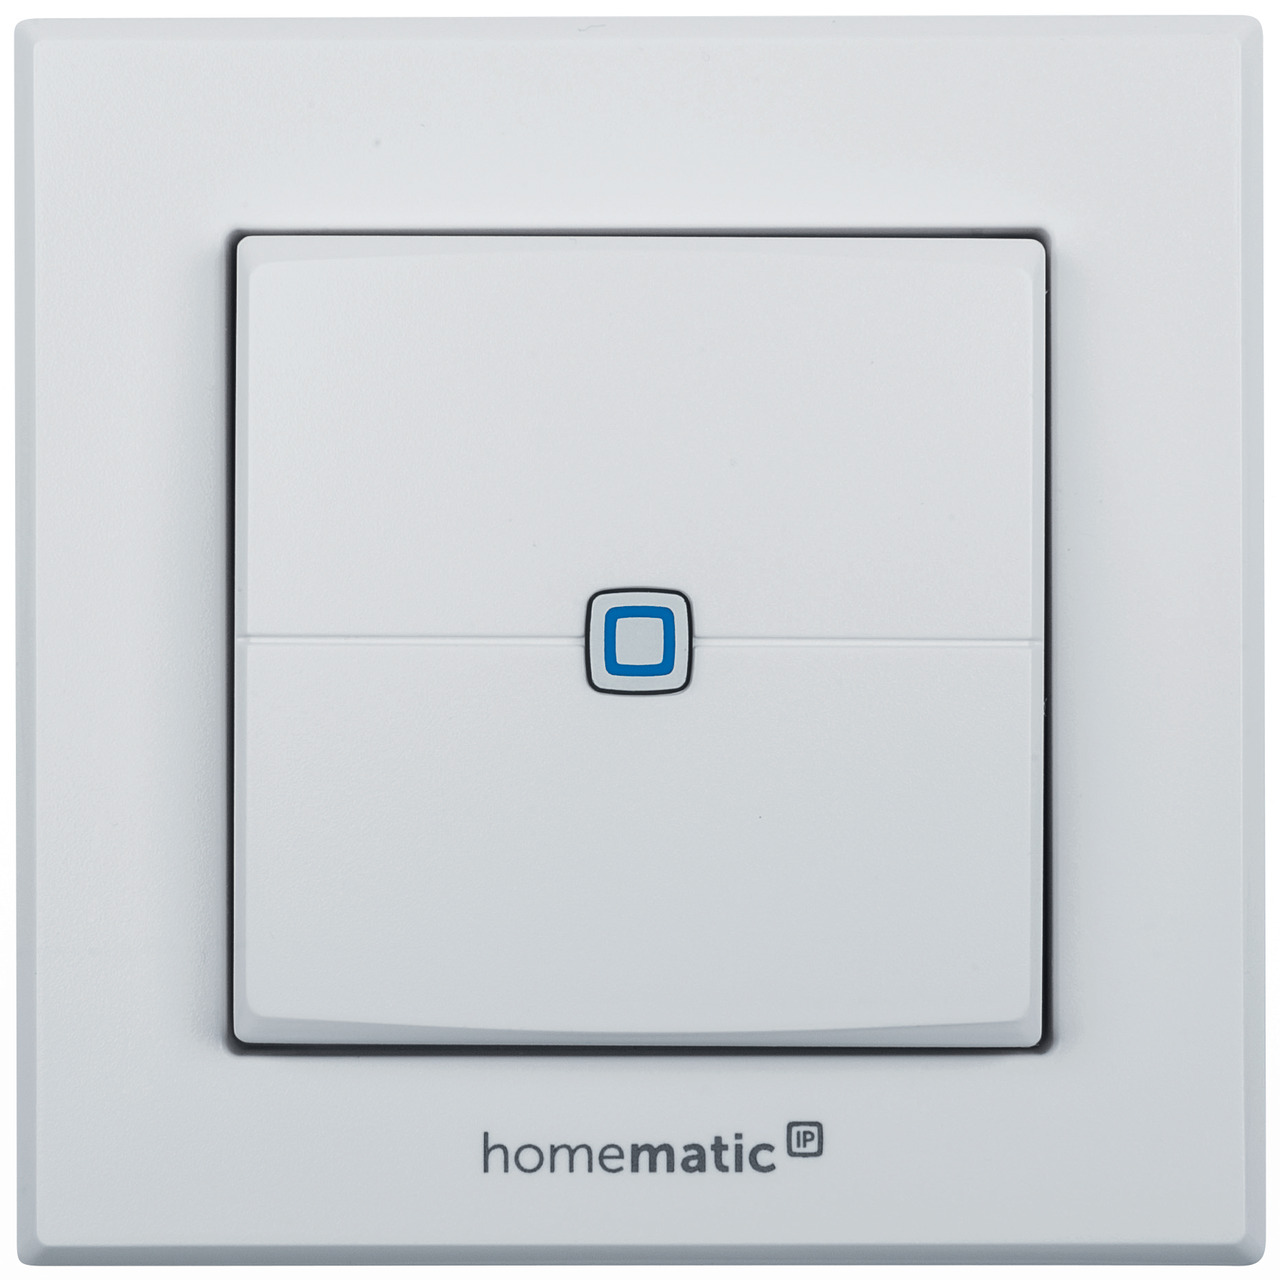 ELV Homematic IP Bausatz Wandtaster HMIP-WRC2- 2-fach für Smart Home - Hausautomation